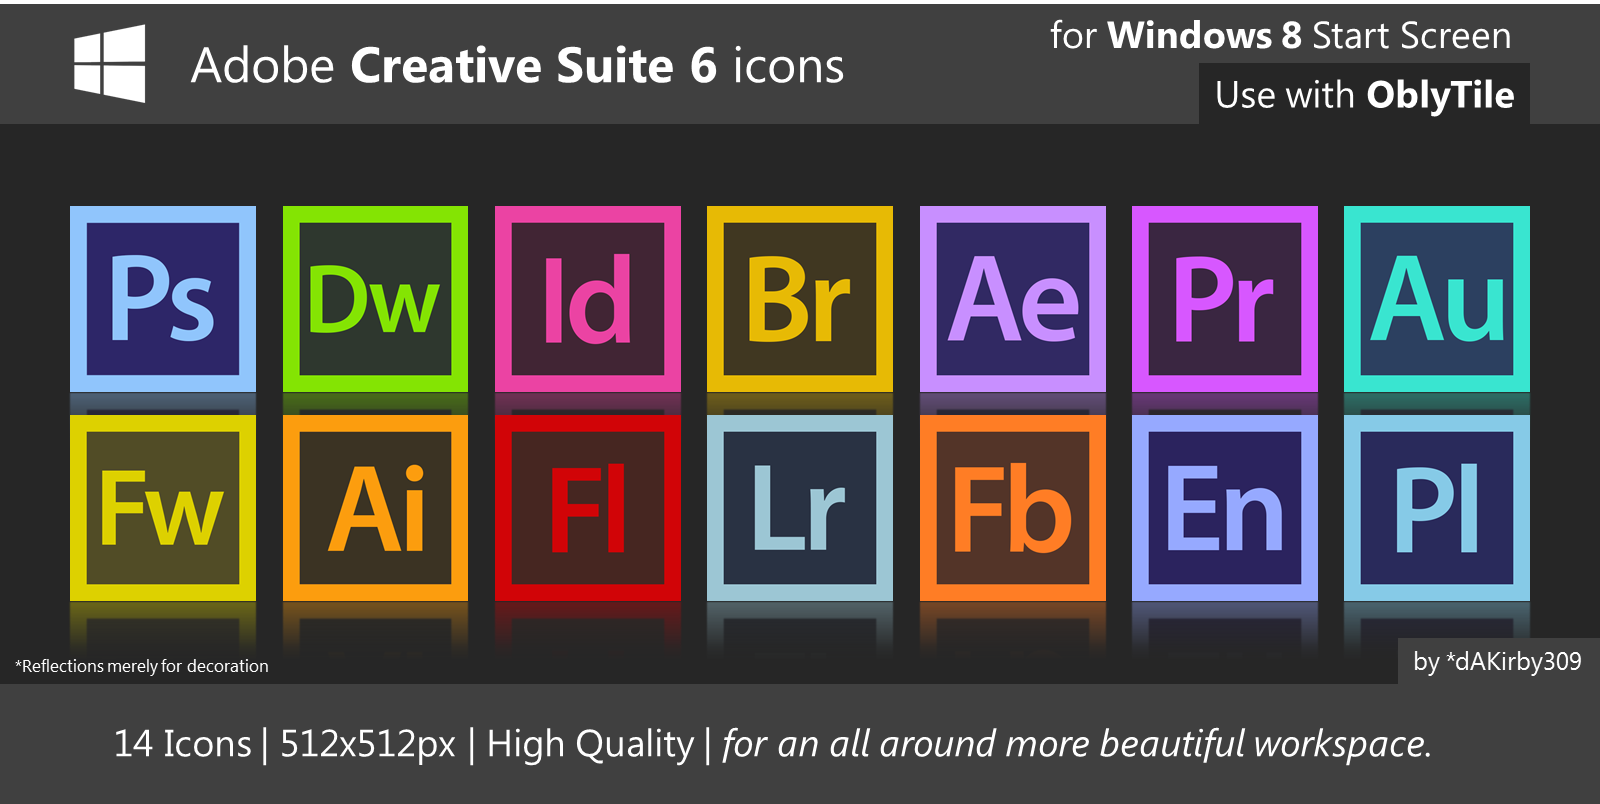 Adobe Illustrator CS6 Icon